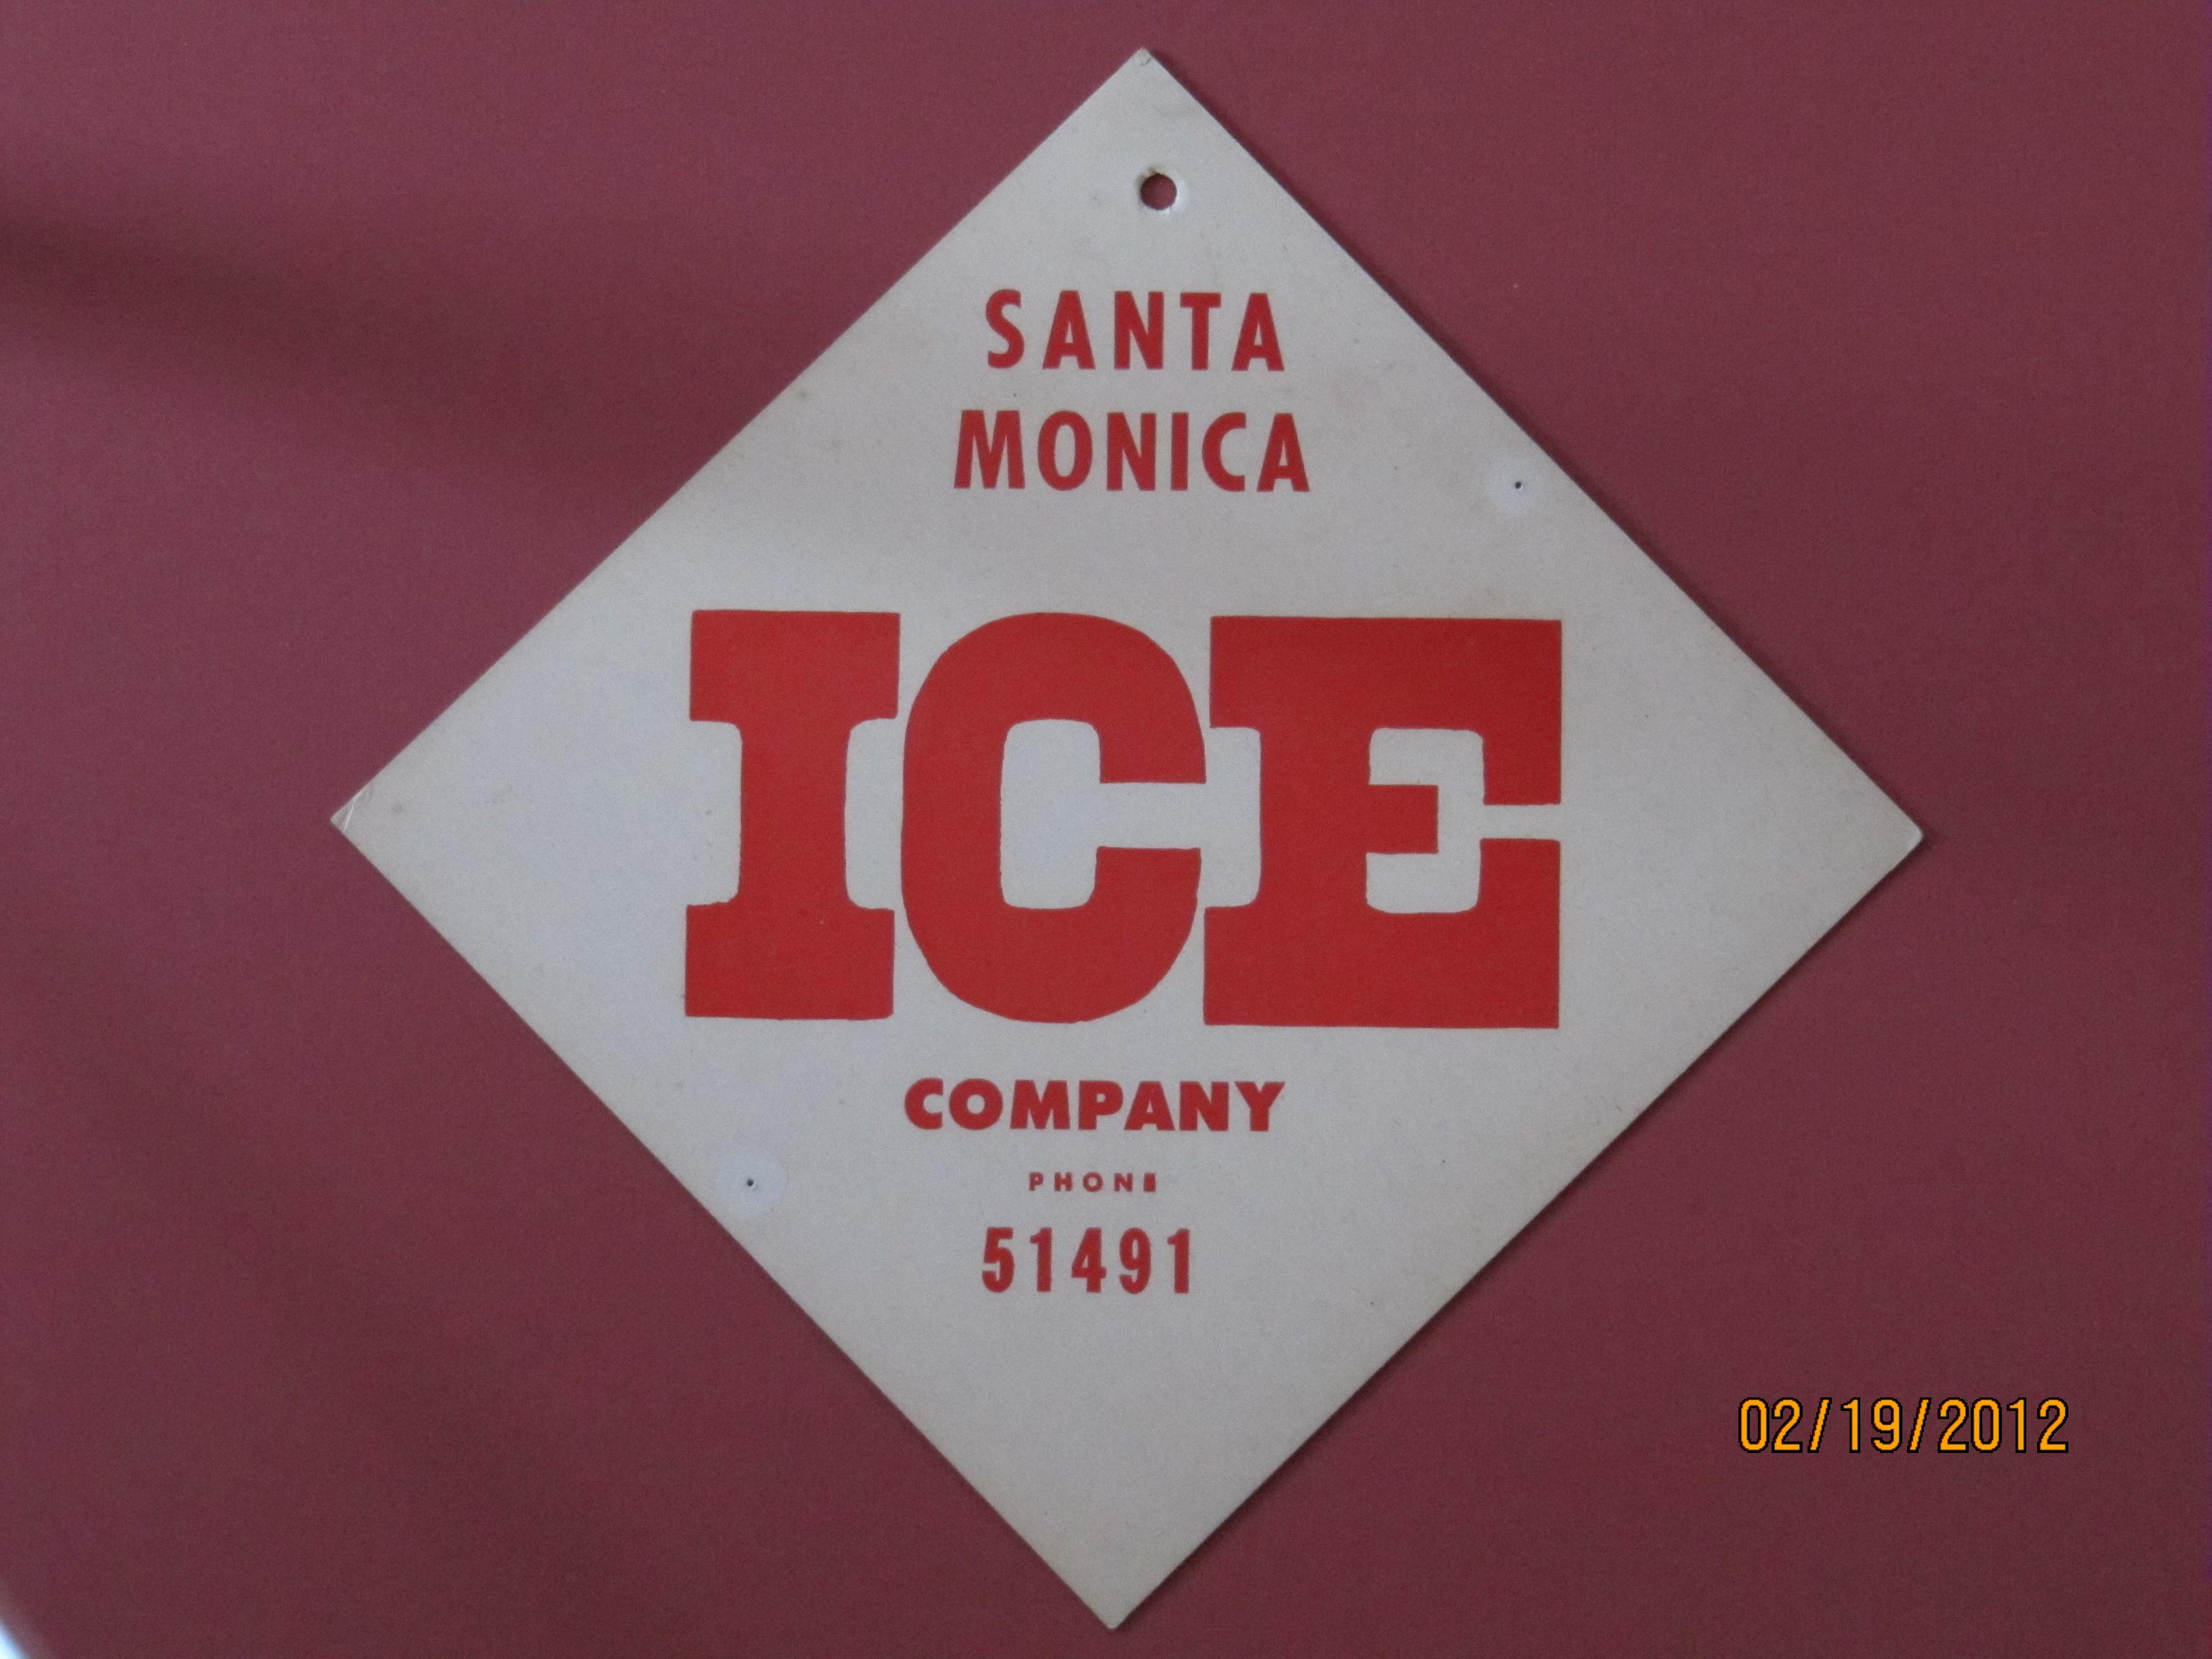 Santa Monica Ice Co.